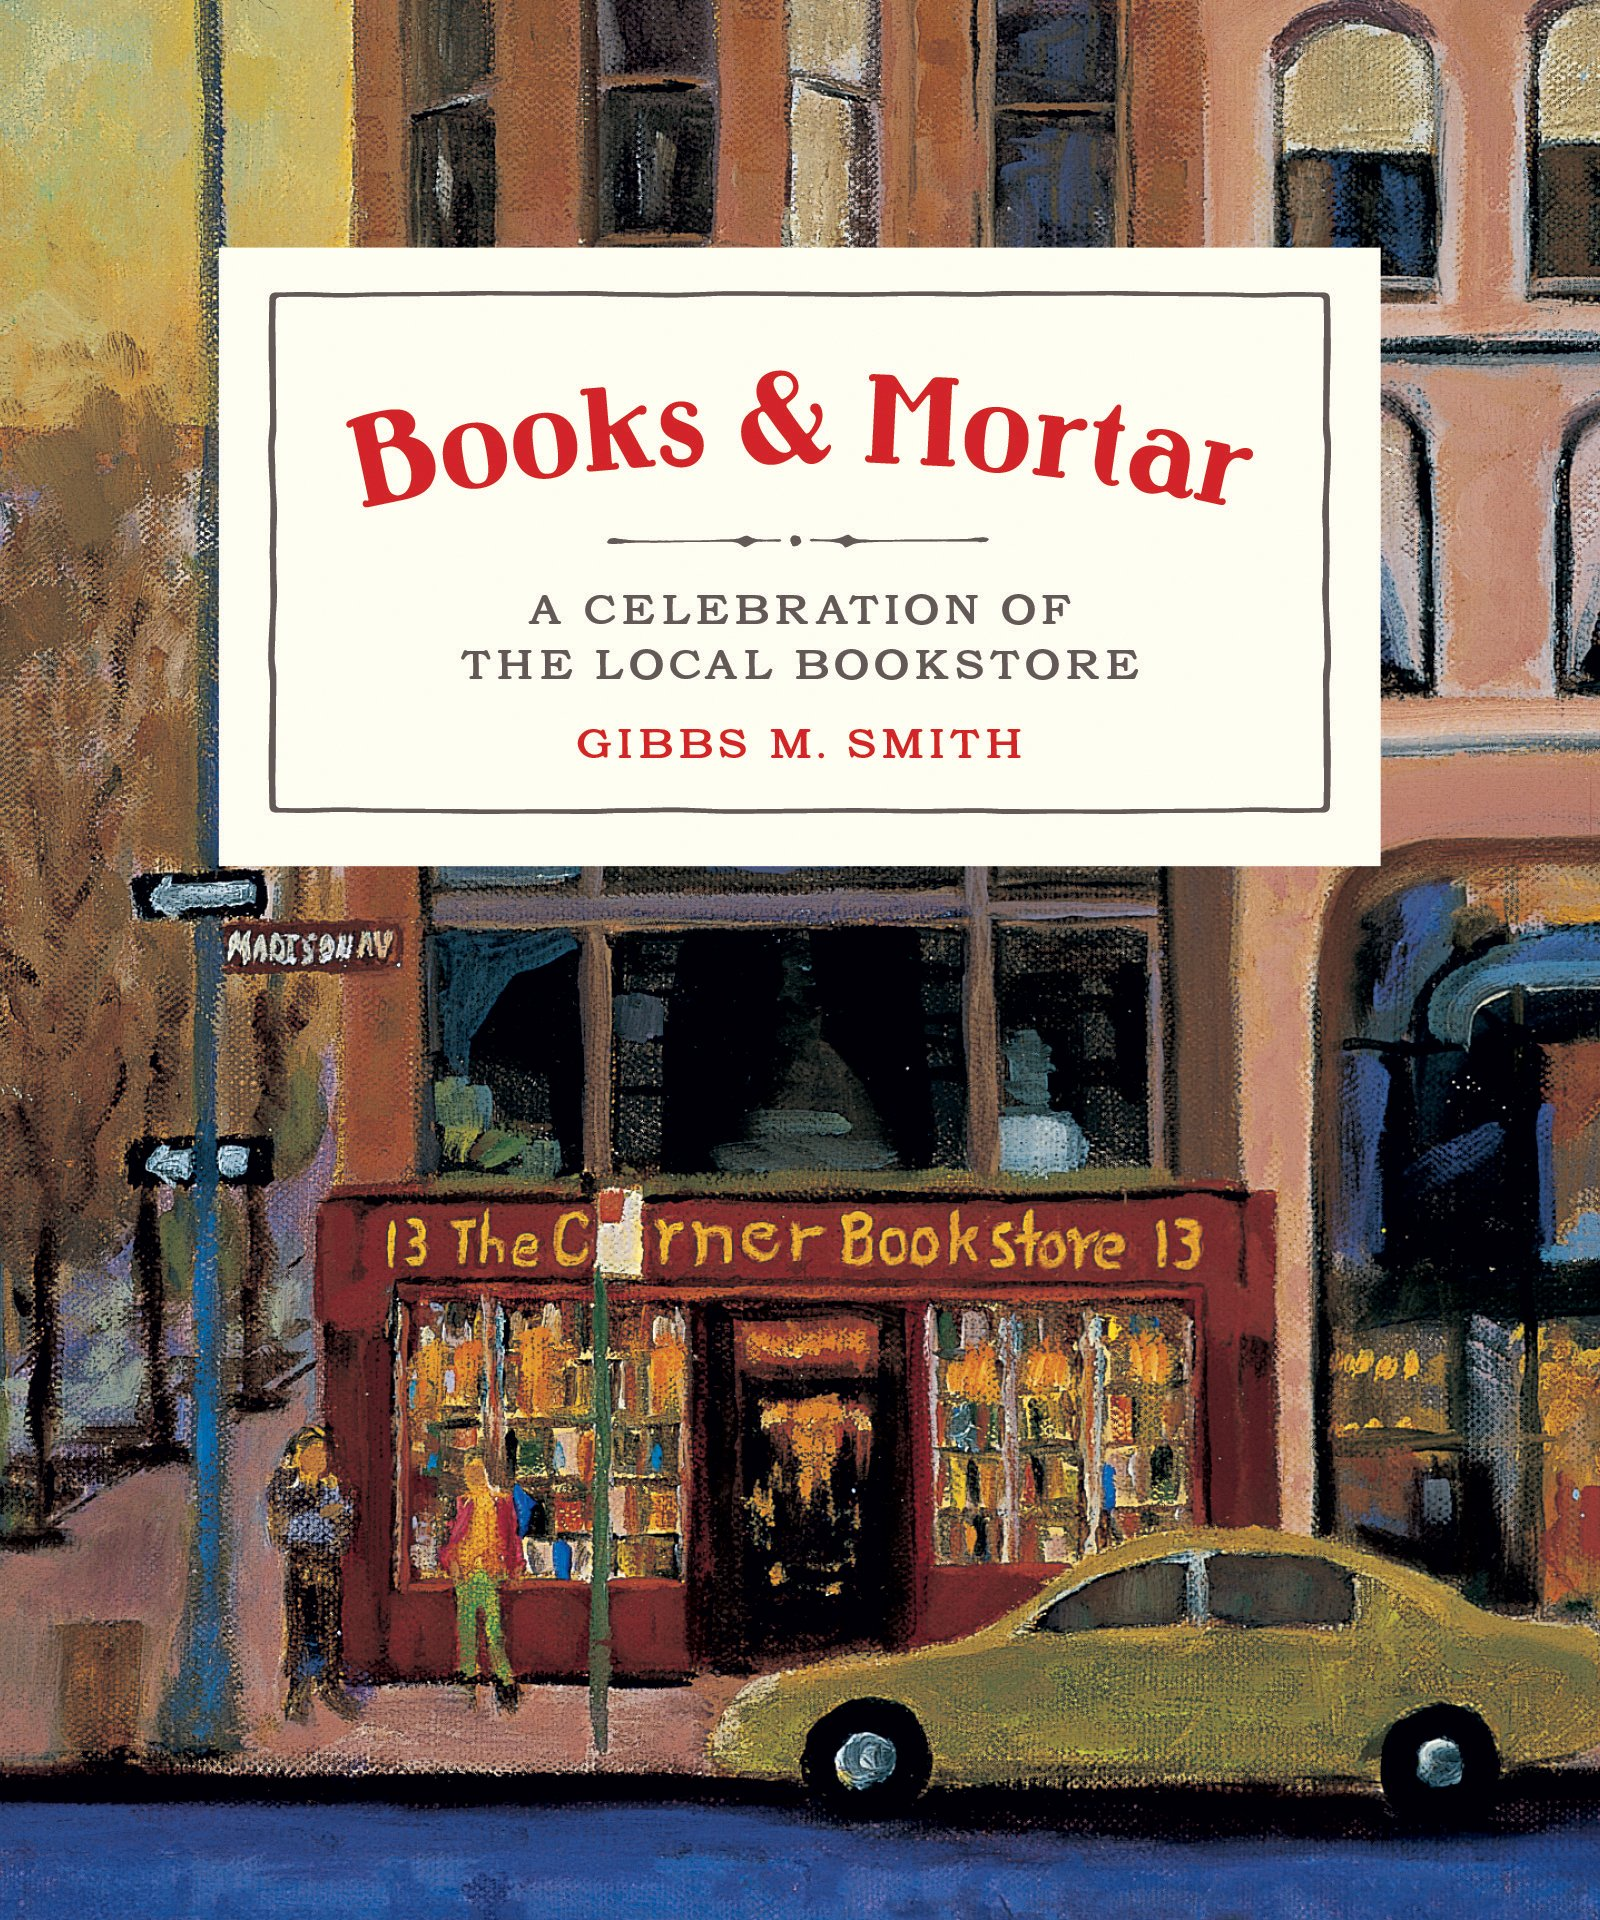 Books & Mortar: A Celebration of the Local Bookstore